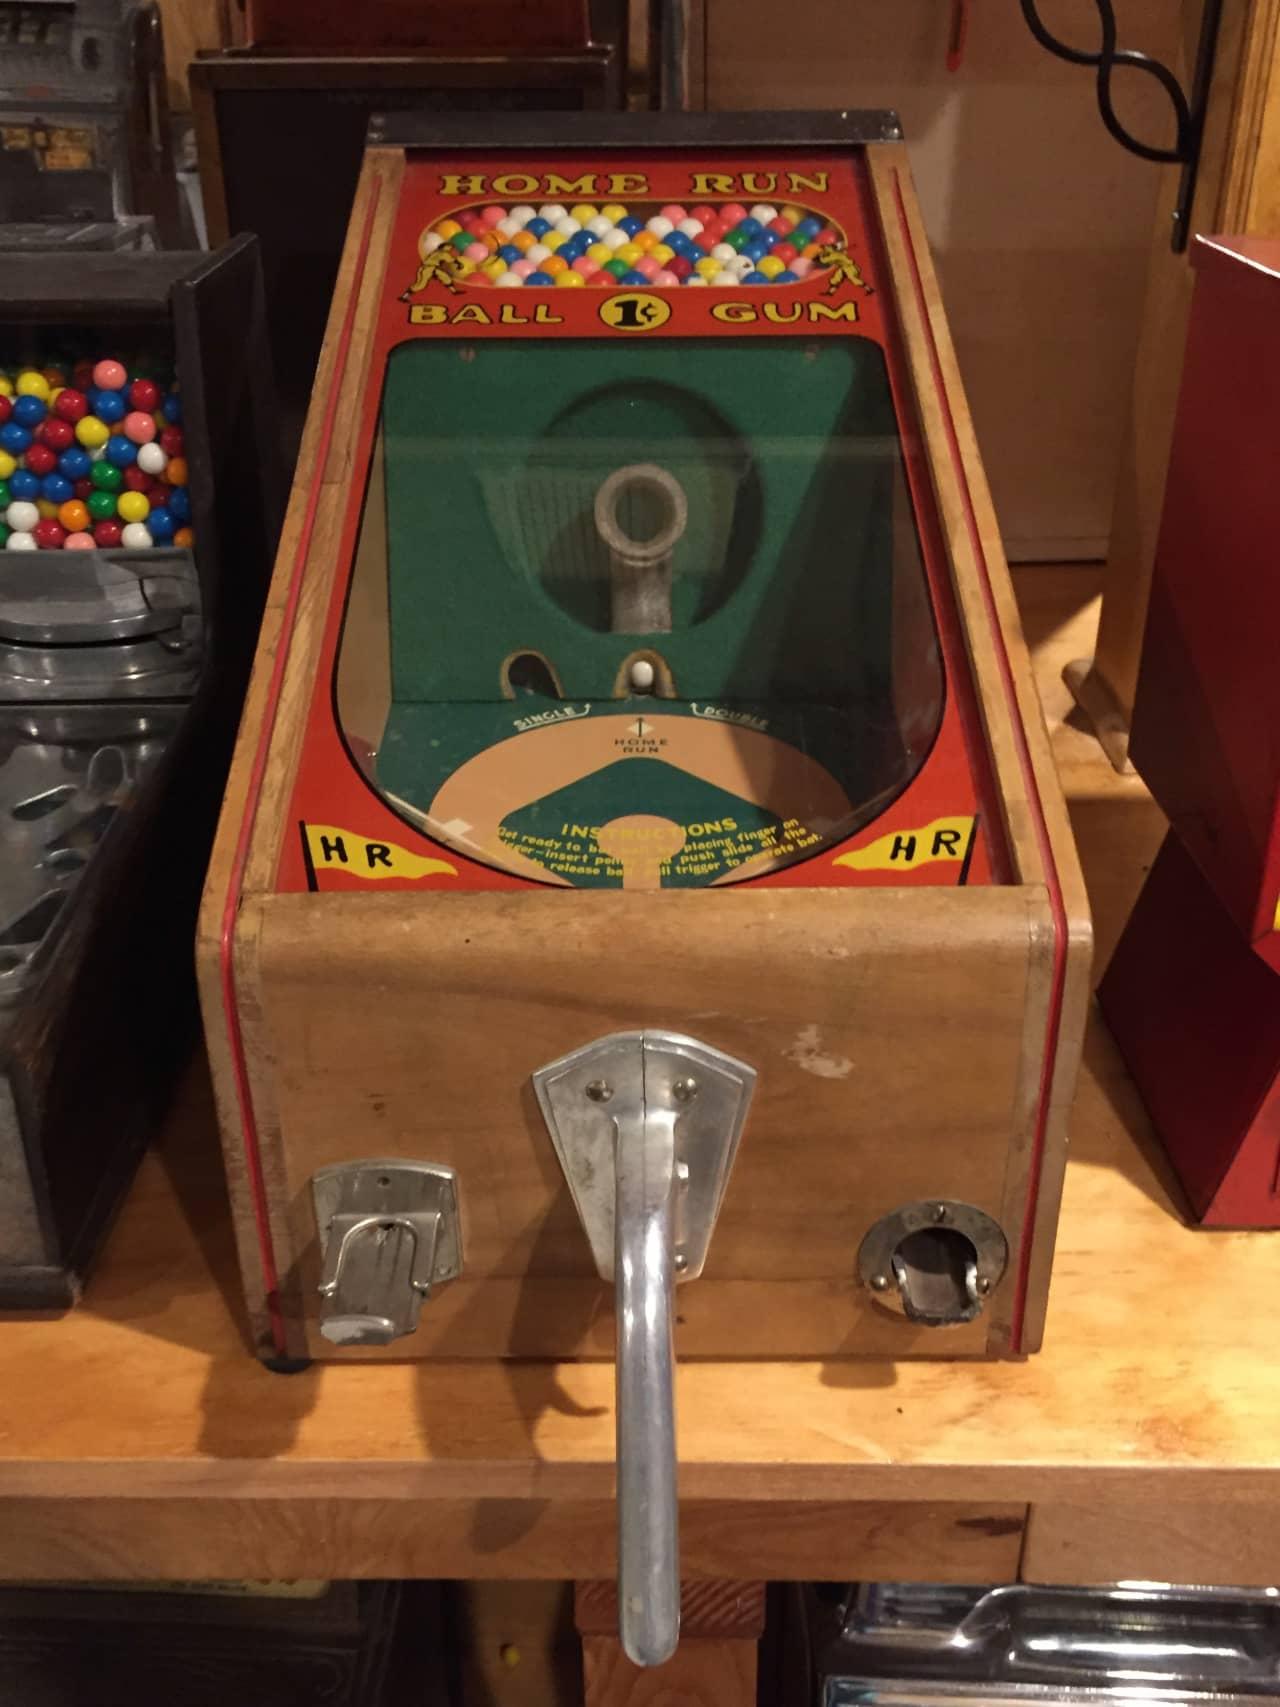 Victor Vending Home Run Baseball Shooter